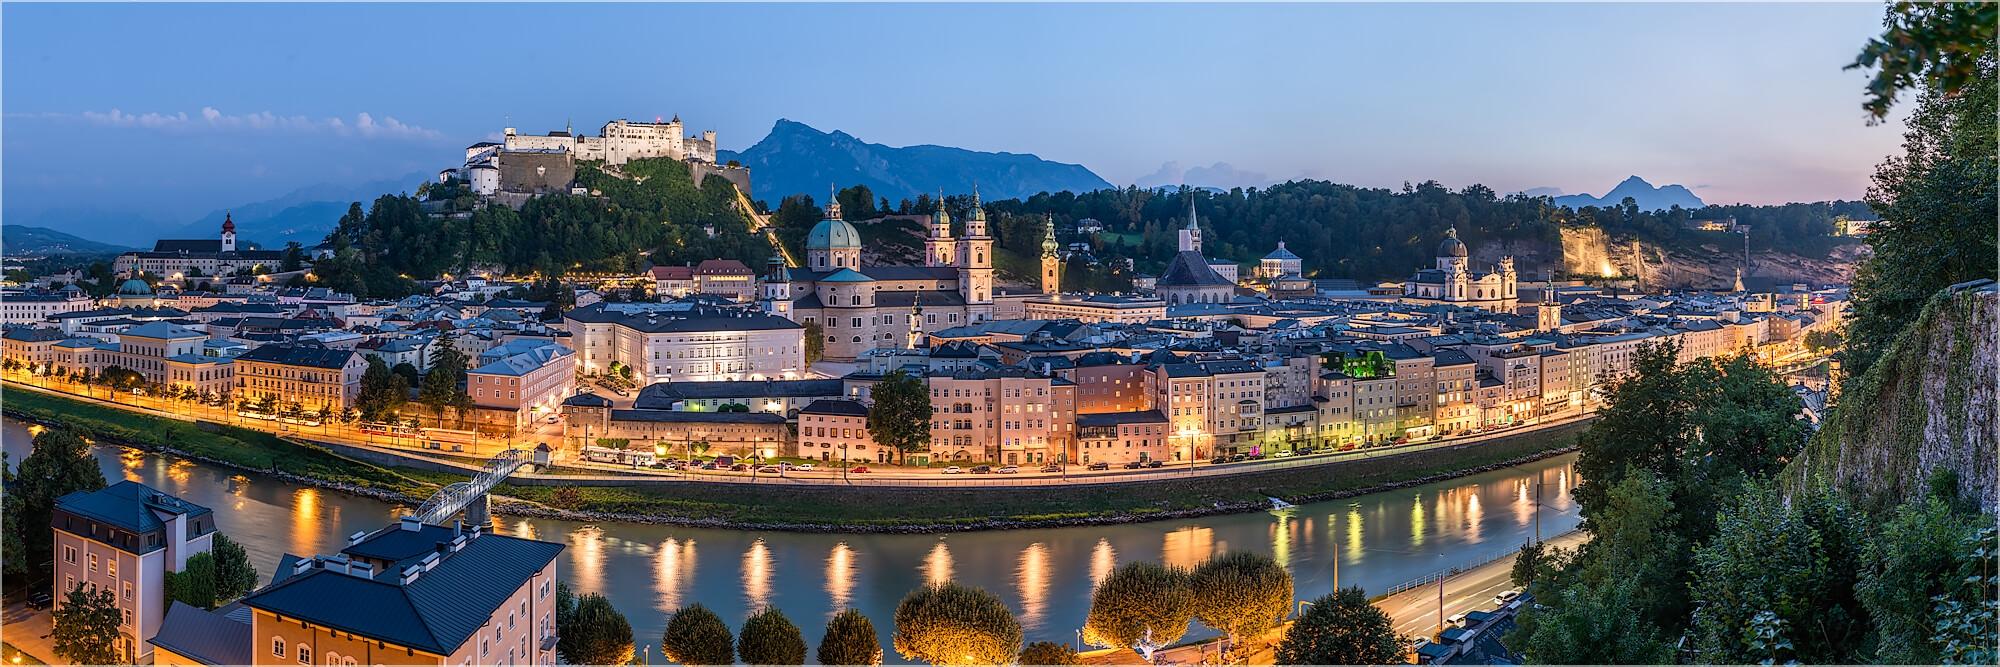 Panoramabild Salzburg im Sonnenuntergang